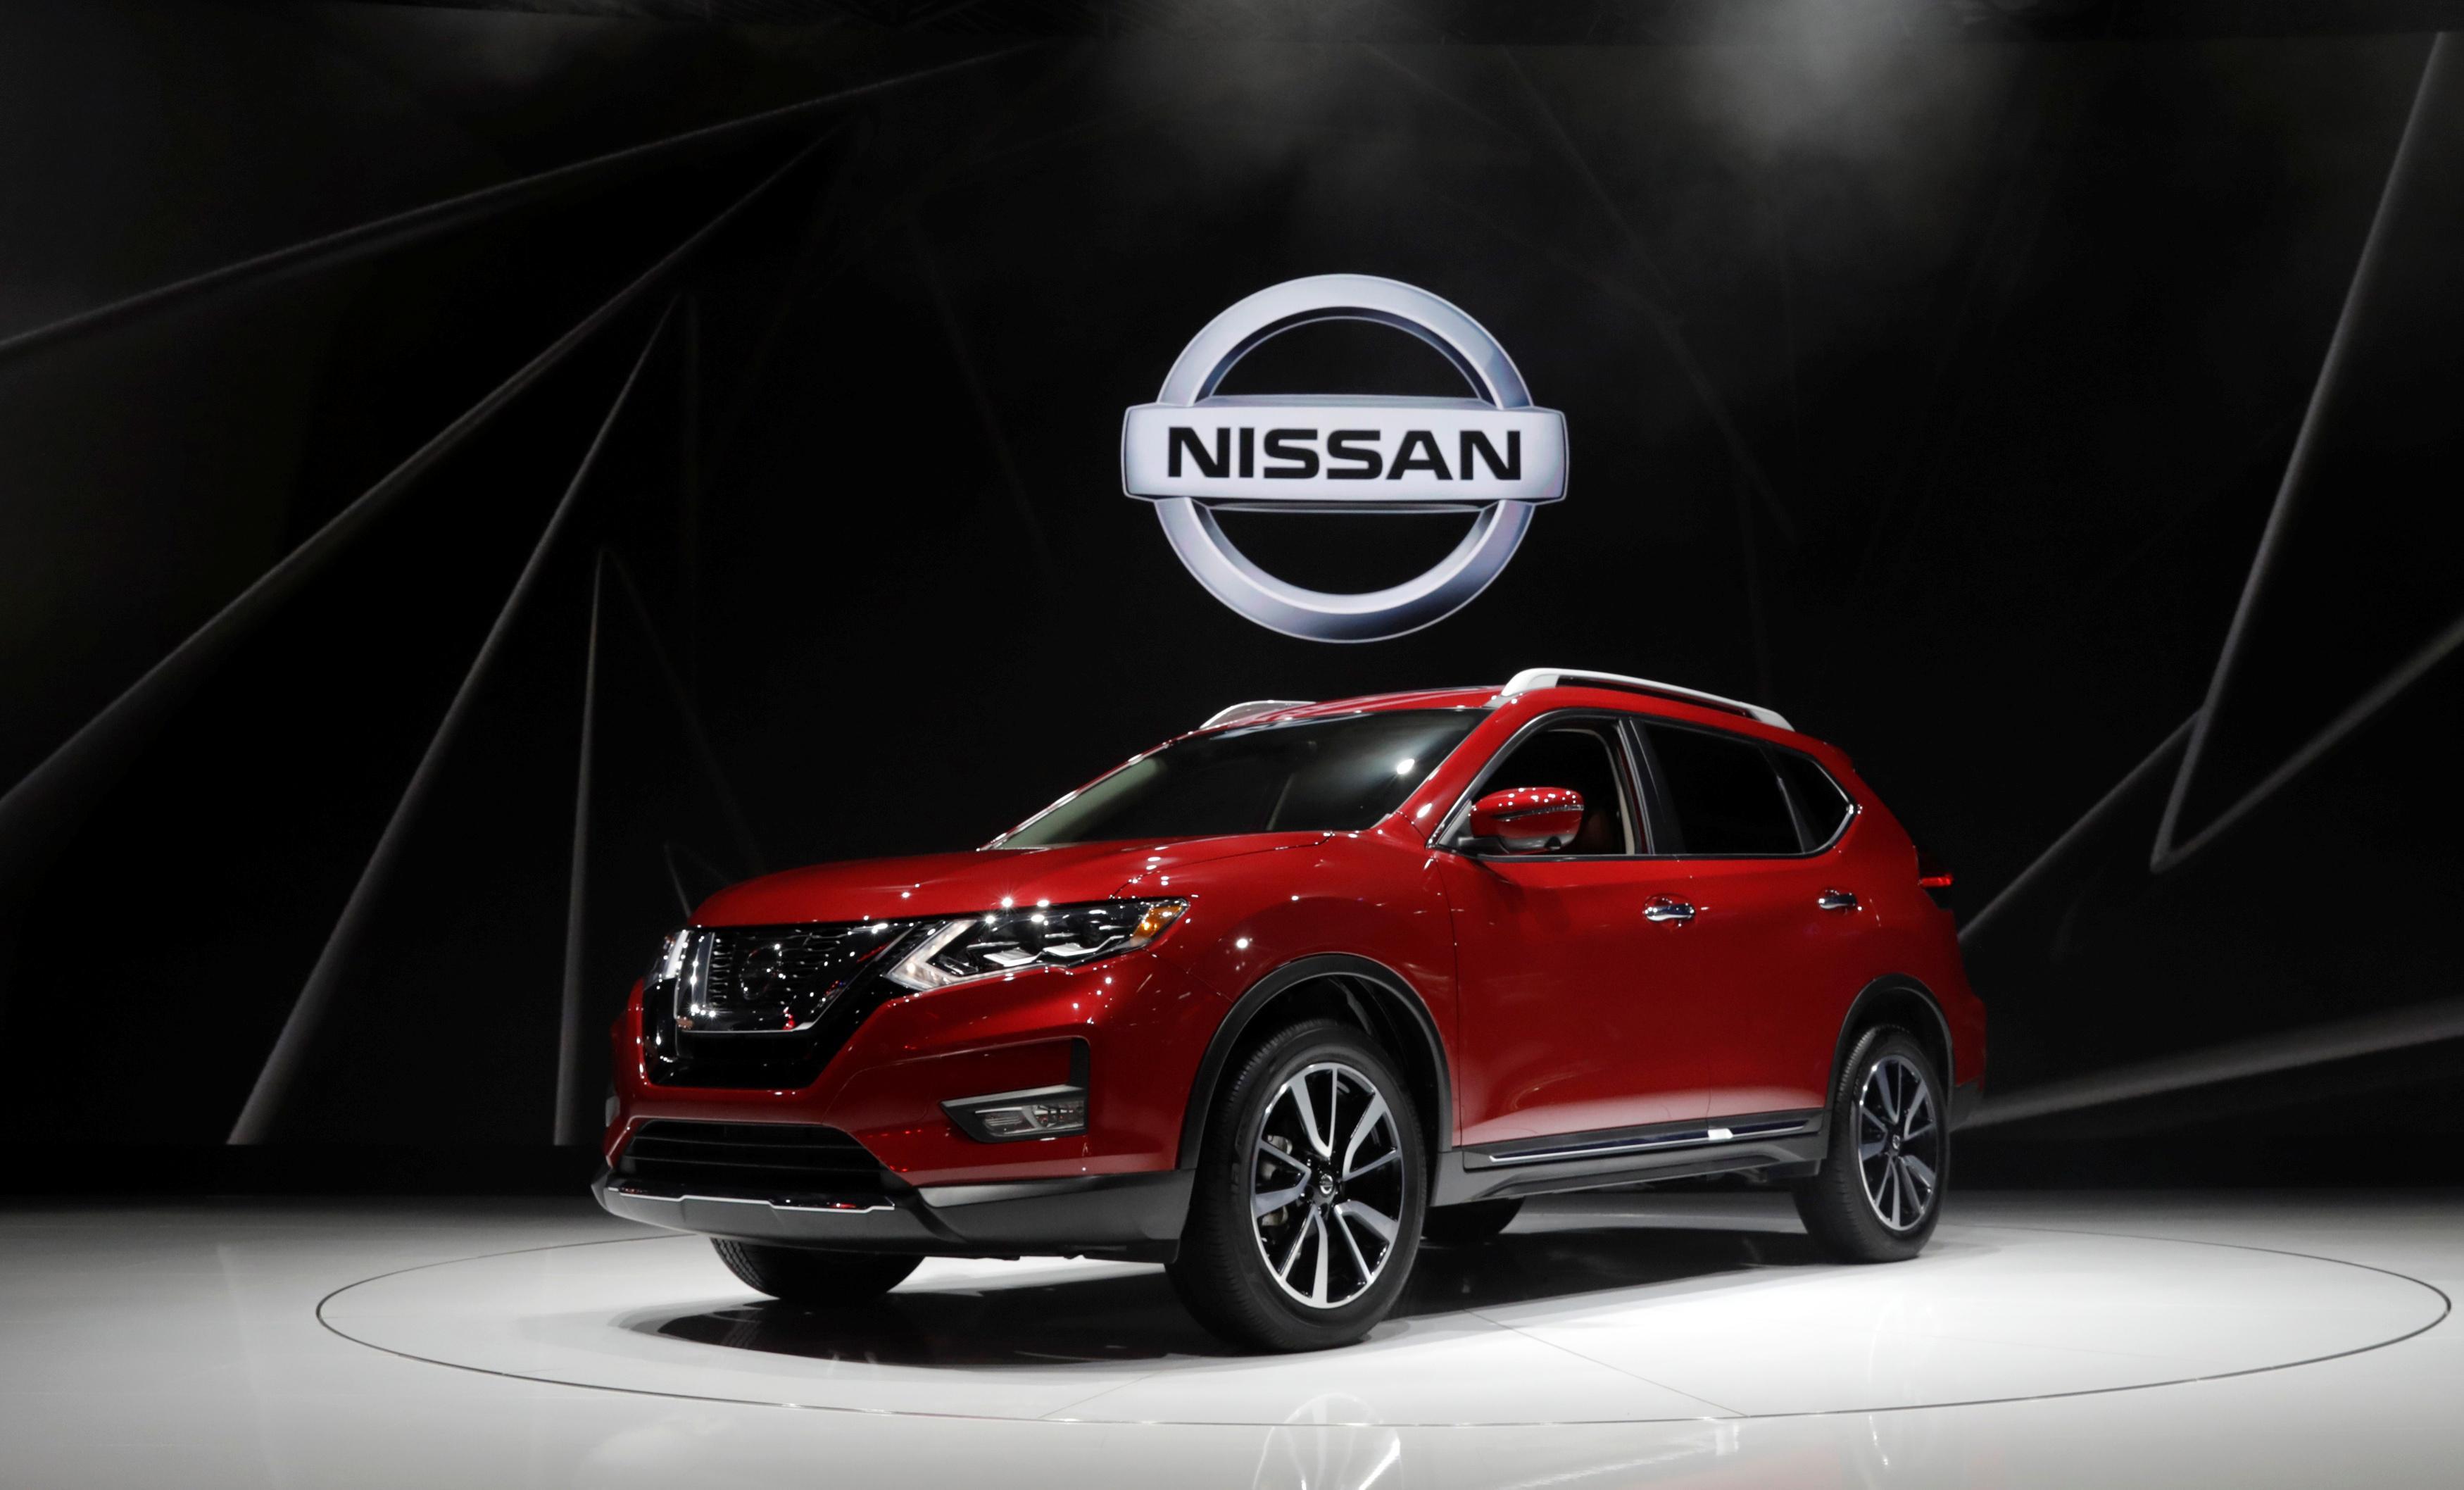 U.S. probes 675,000 Nissan SUVs over unexpected braking